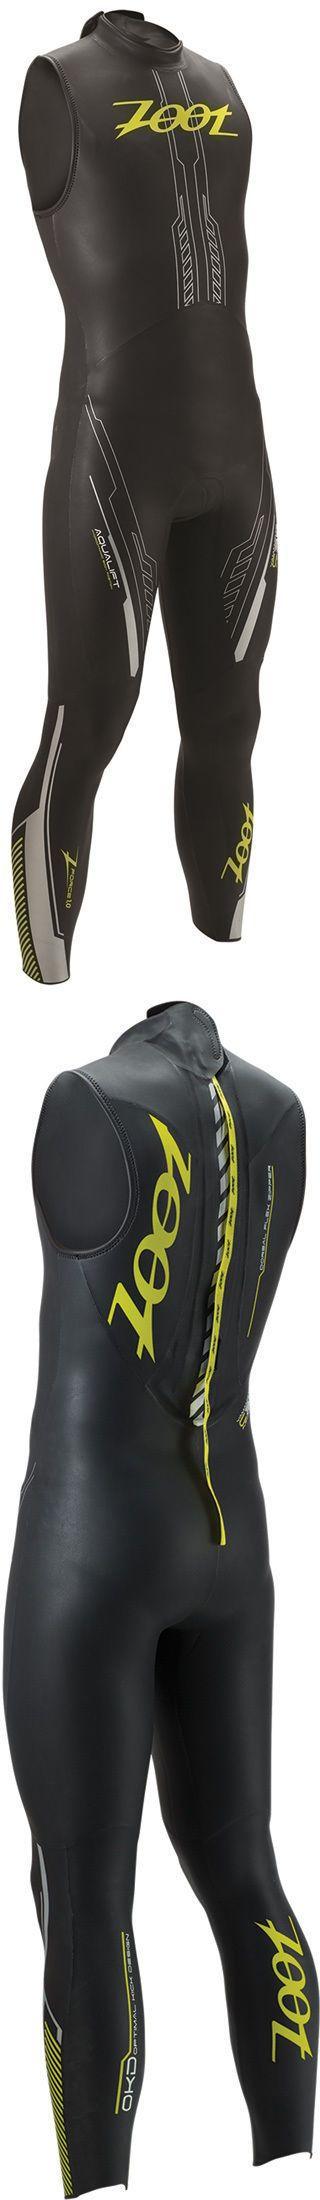 Triathlon 2918: New Zoot Z Force 1.0 Sl Wetzoot - Men S Triathlon Wetsuit - Black Flash -> BUY IT NOW ONLY: $129.99 on eBay!